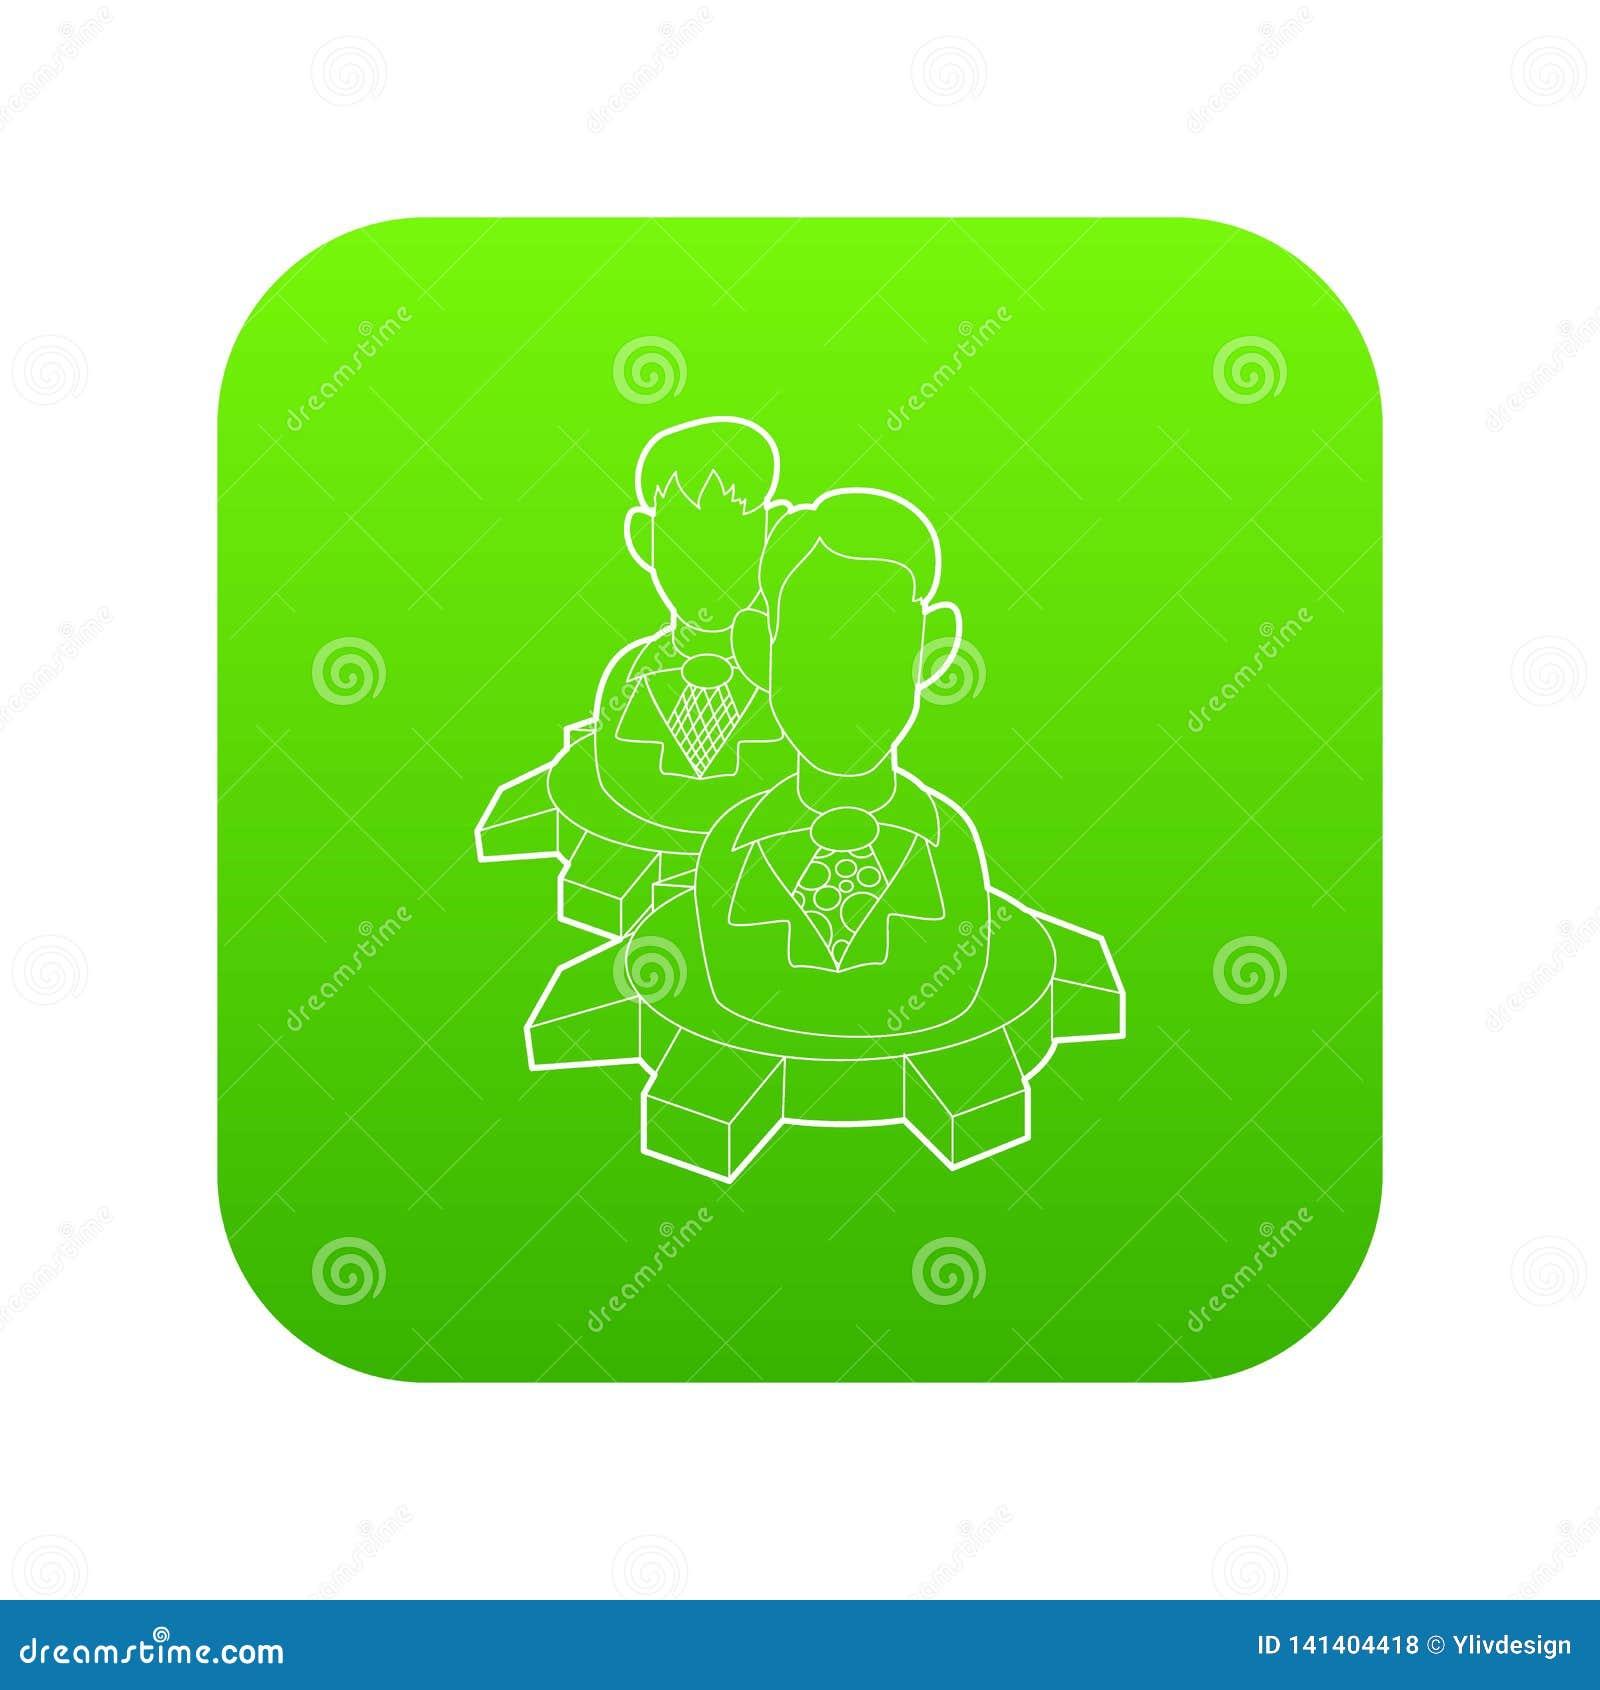 Люди внутри вектора зеленого цвета значка колеса шестерни